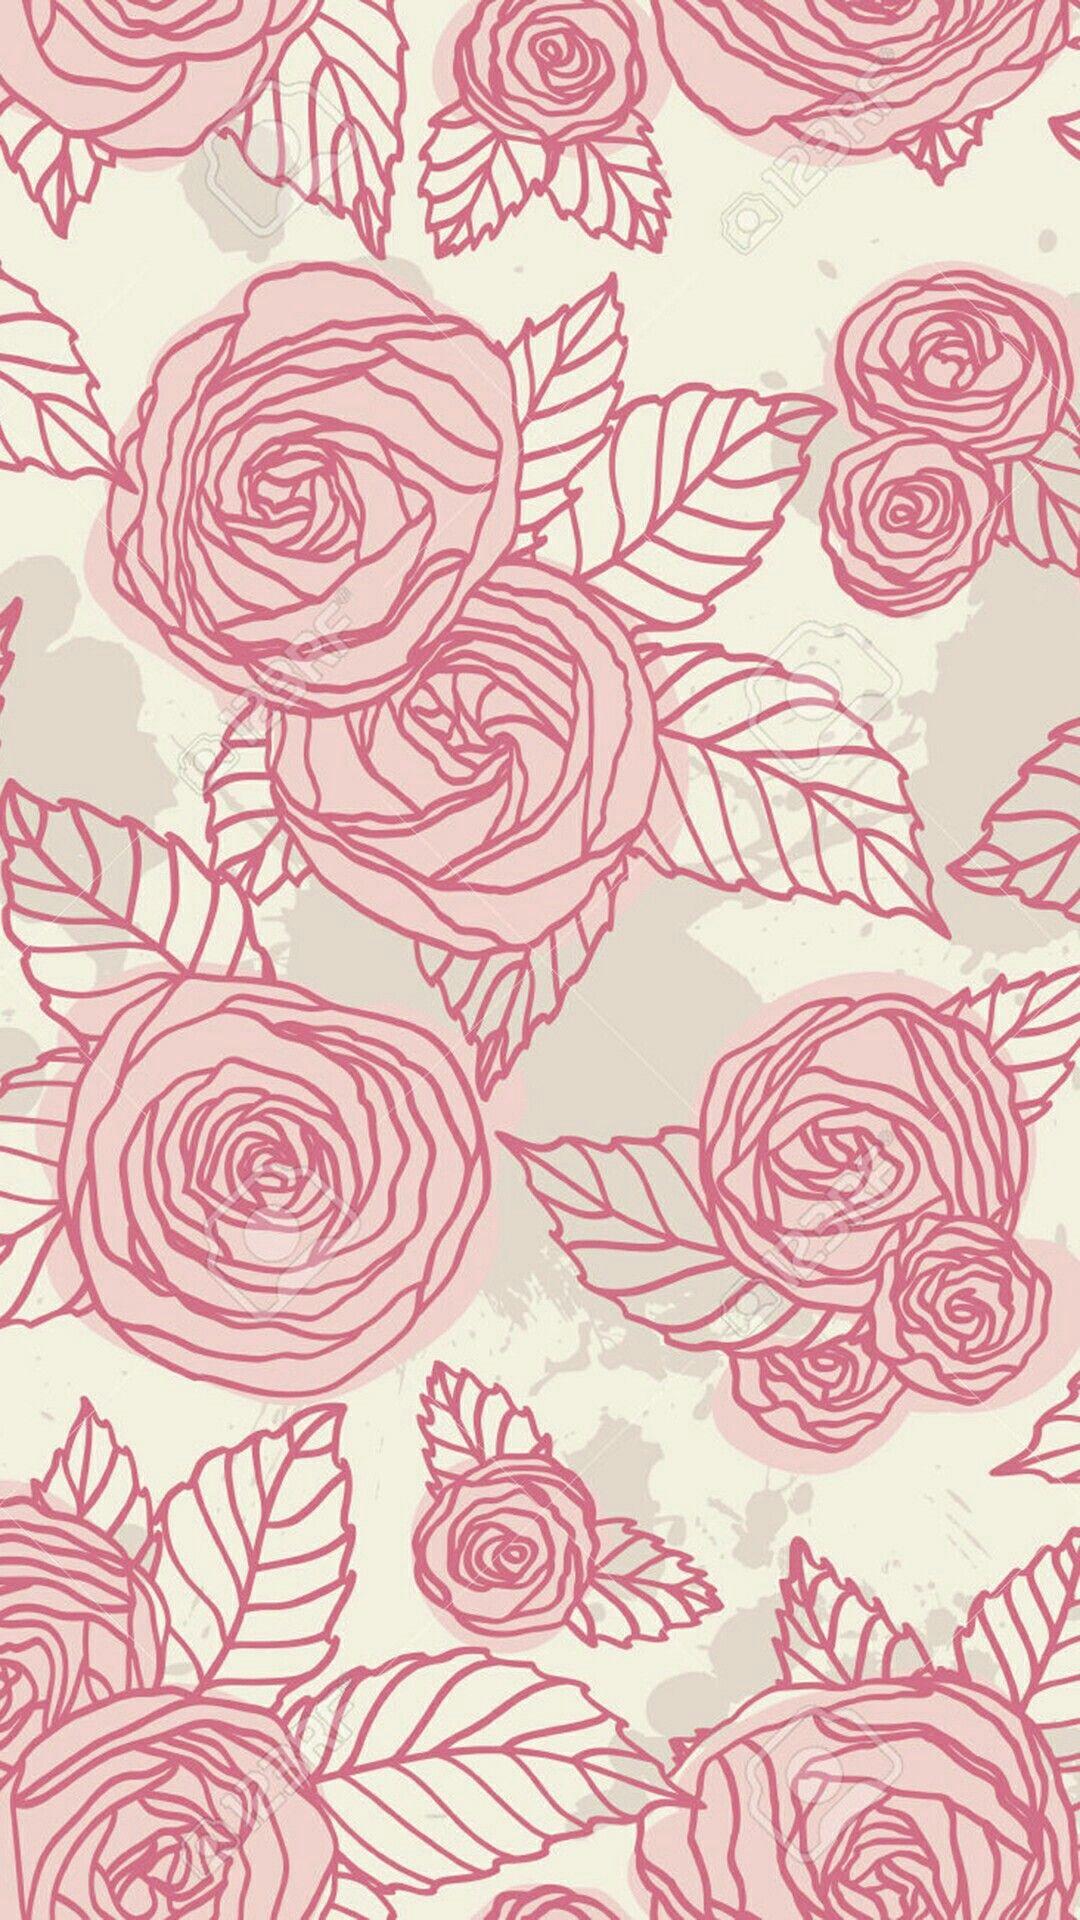 Rosa Wallpaper Lockscreen Padrao Vintage Iphone